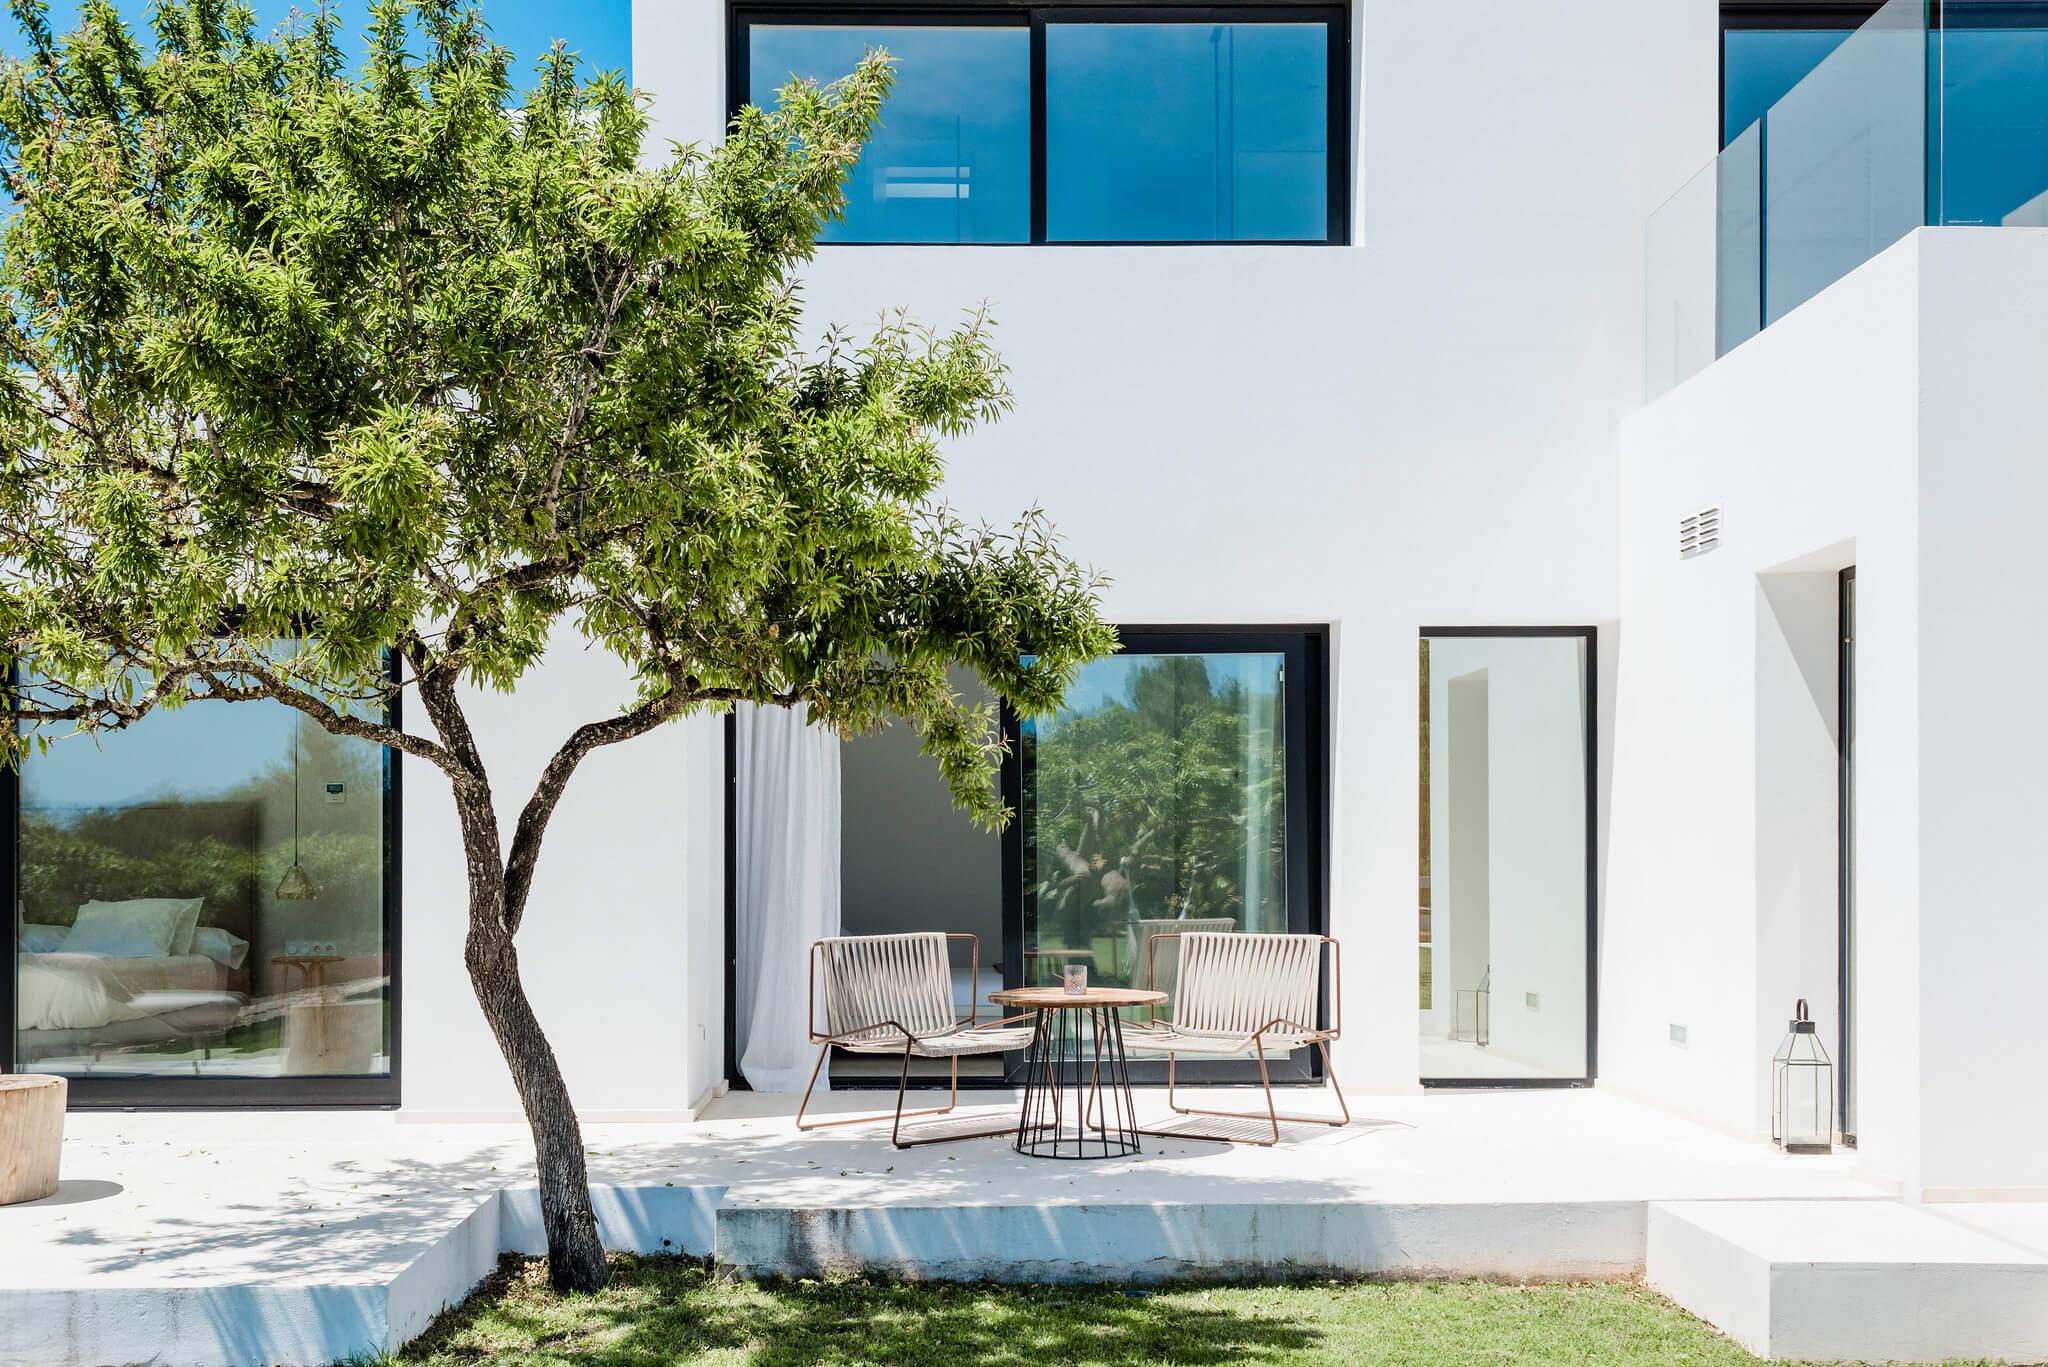 https://www.white-ibiza.com/wp-content/uploads/2020/06/white-ibiza-villas-can-carmen-exterior-another-seatingarea.jpg